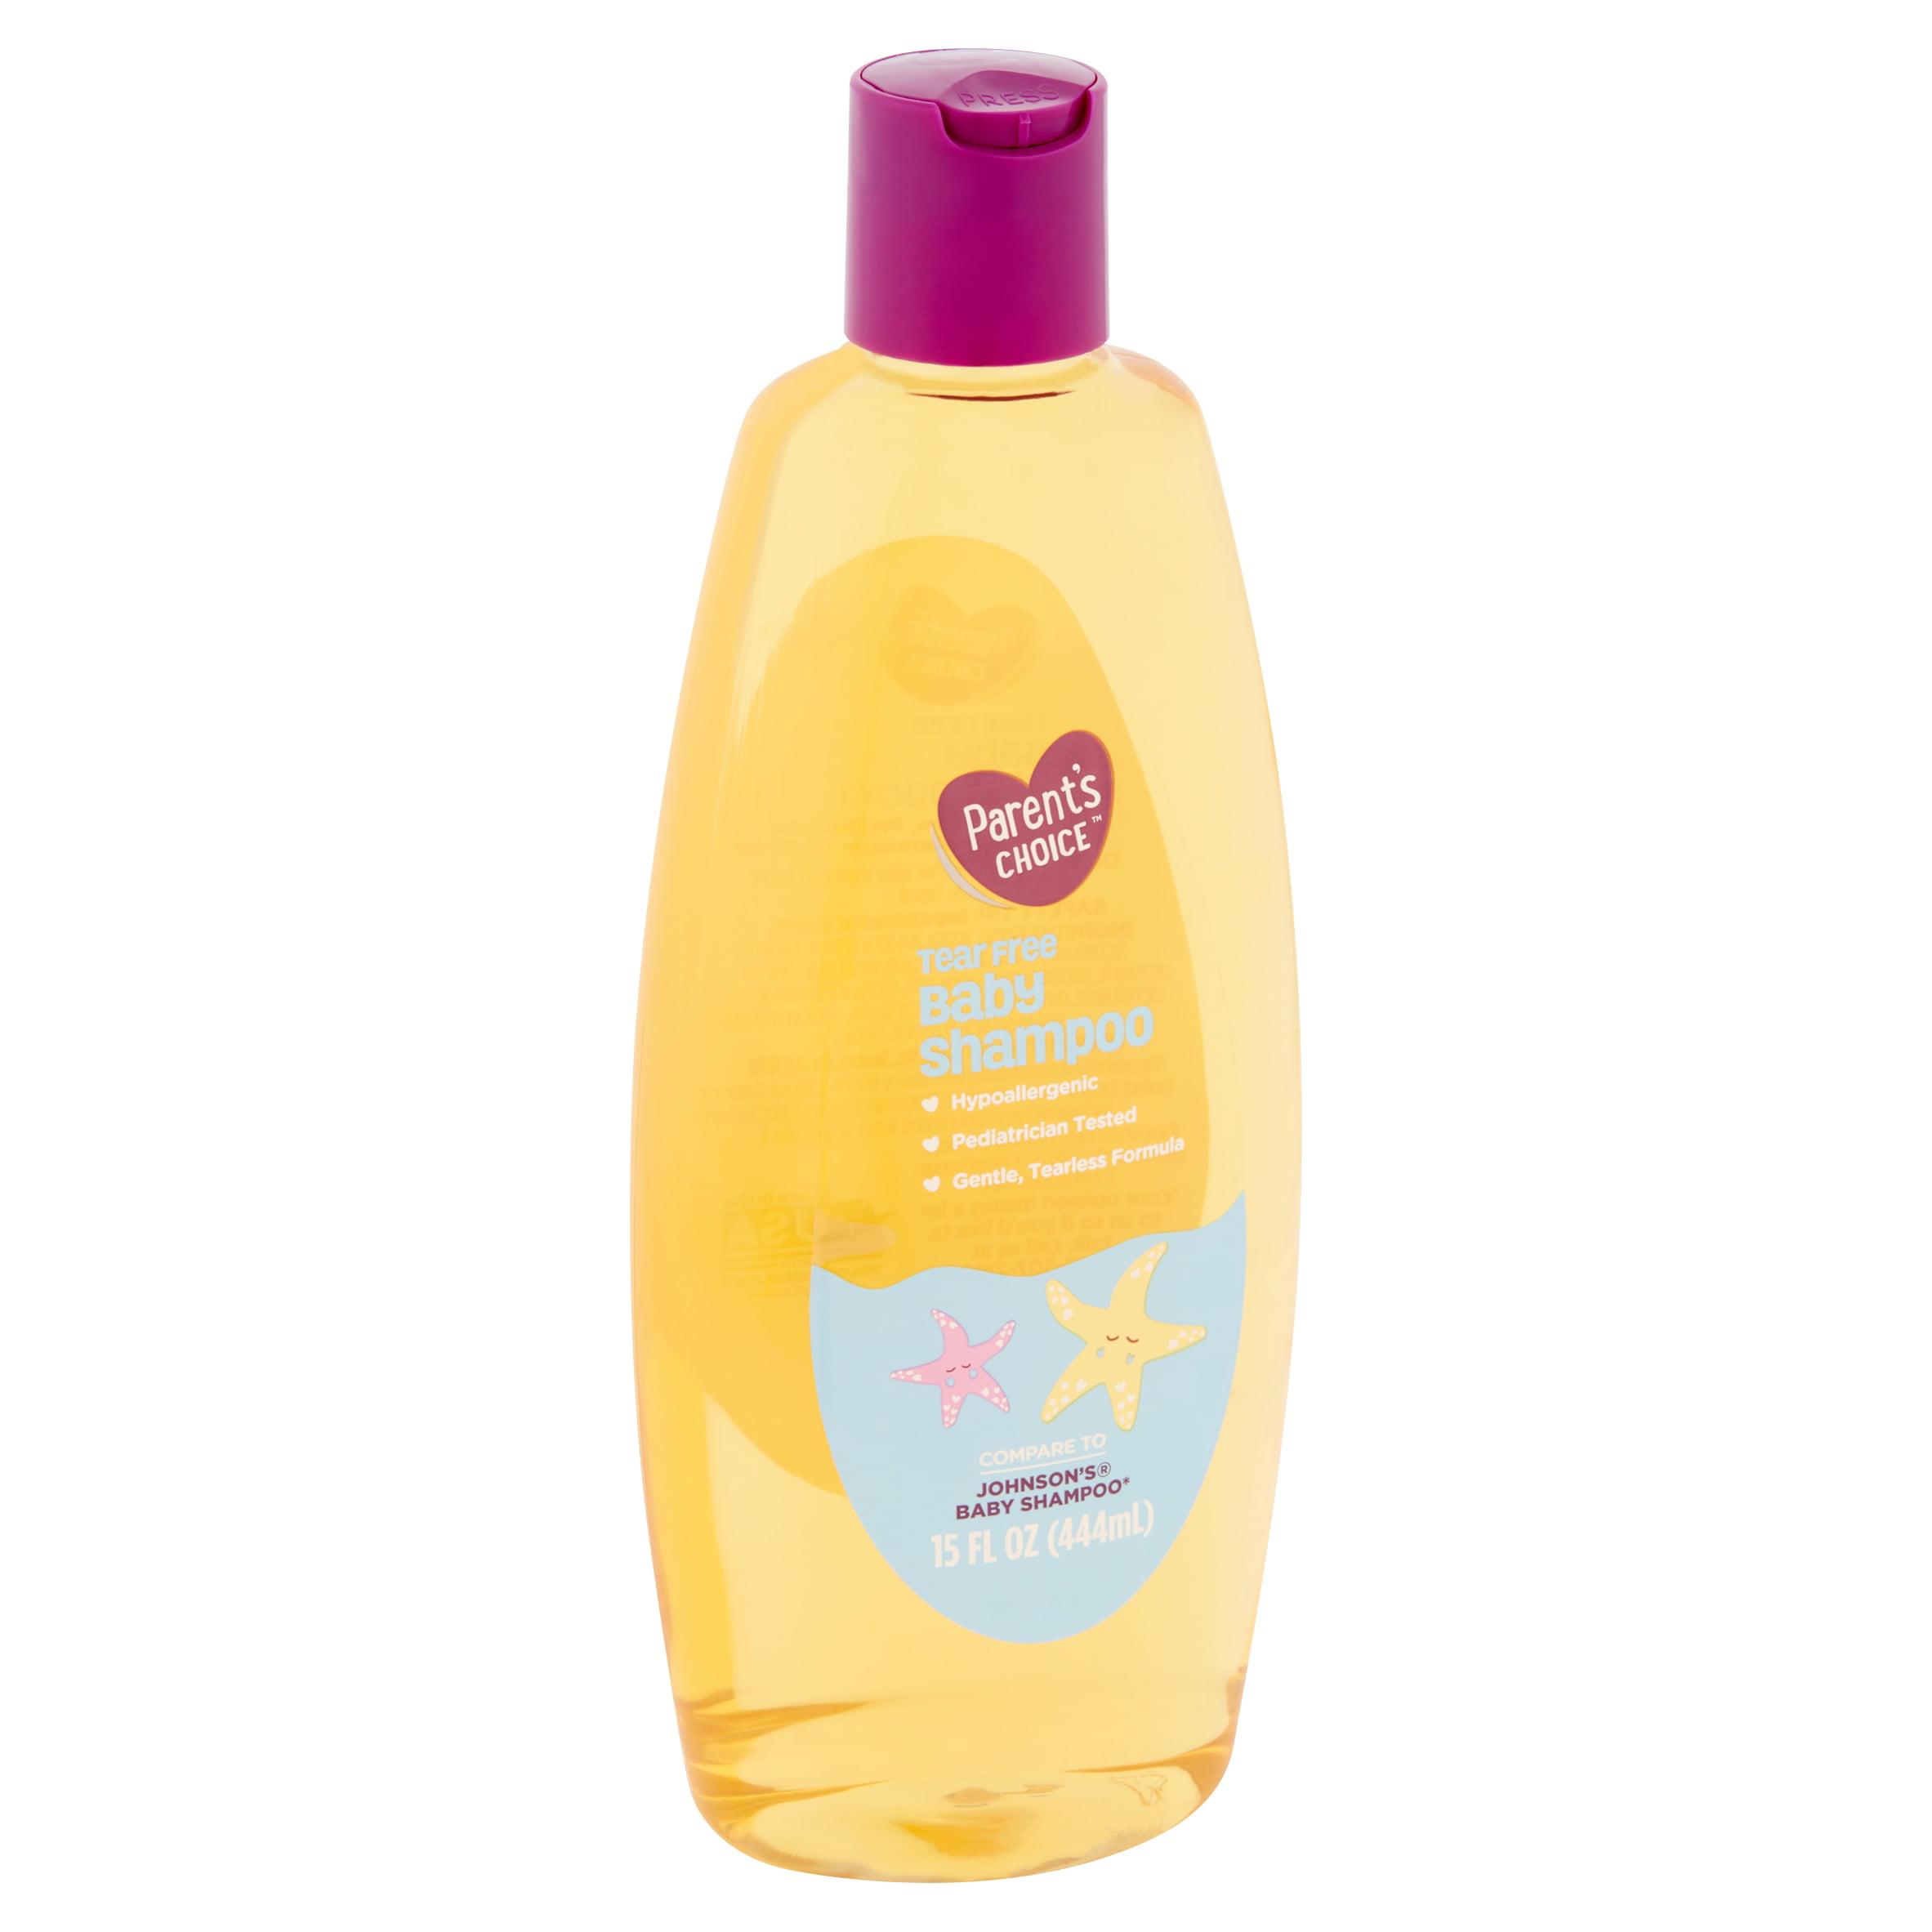 Parent's Choice Tear-Free Baby Shampoo, 15 fl oz by Parent%27s Choice